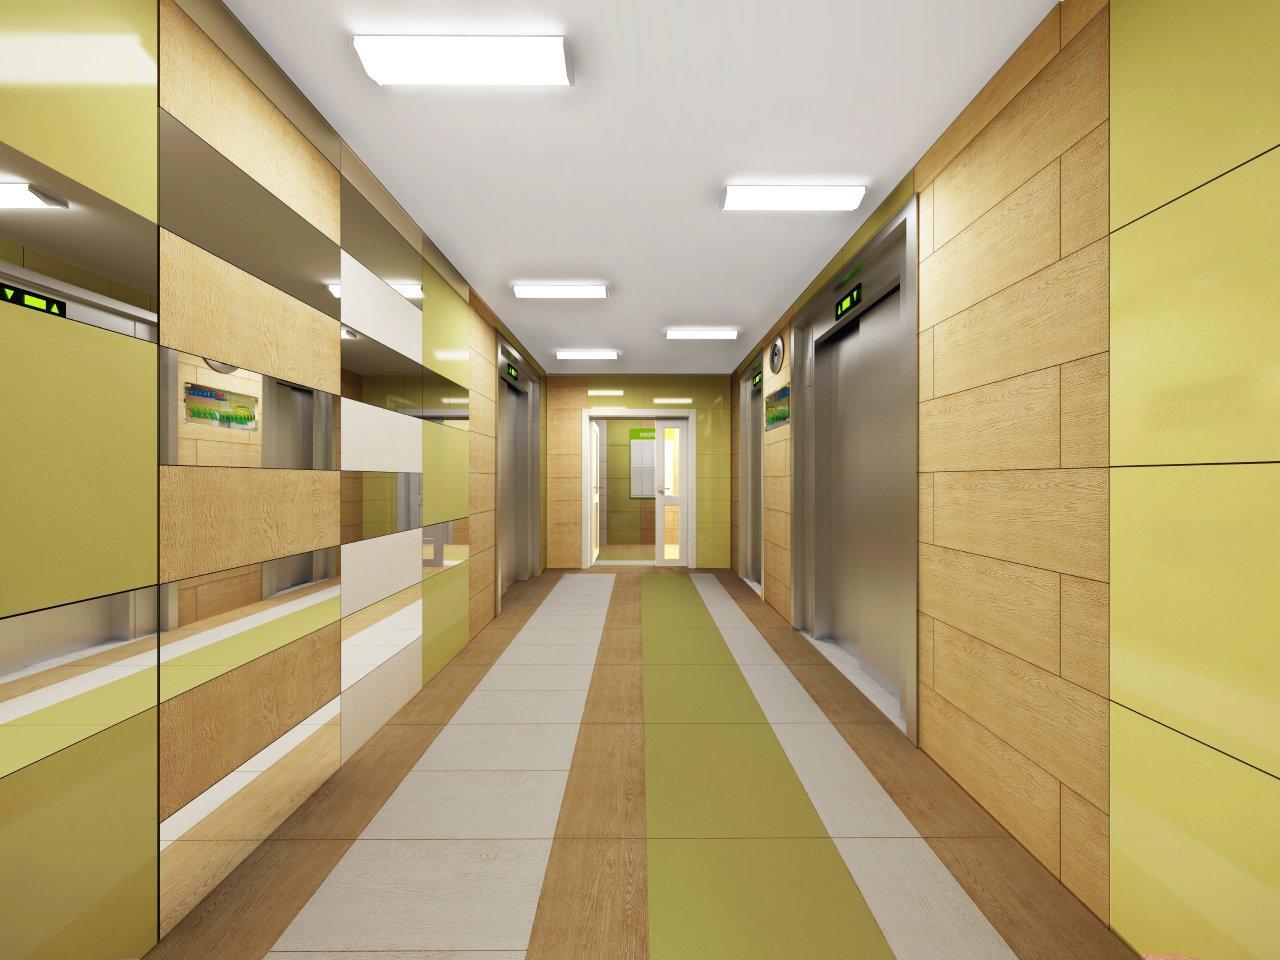 Дизайн общего коридора на площадке фото